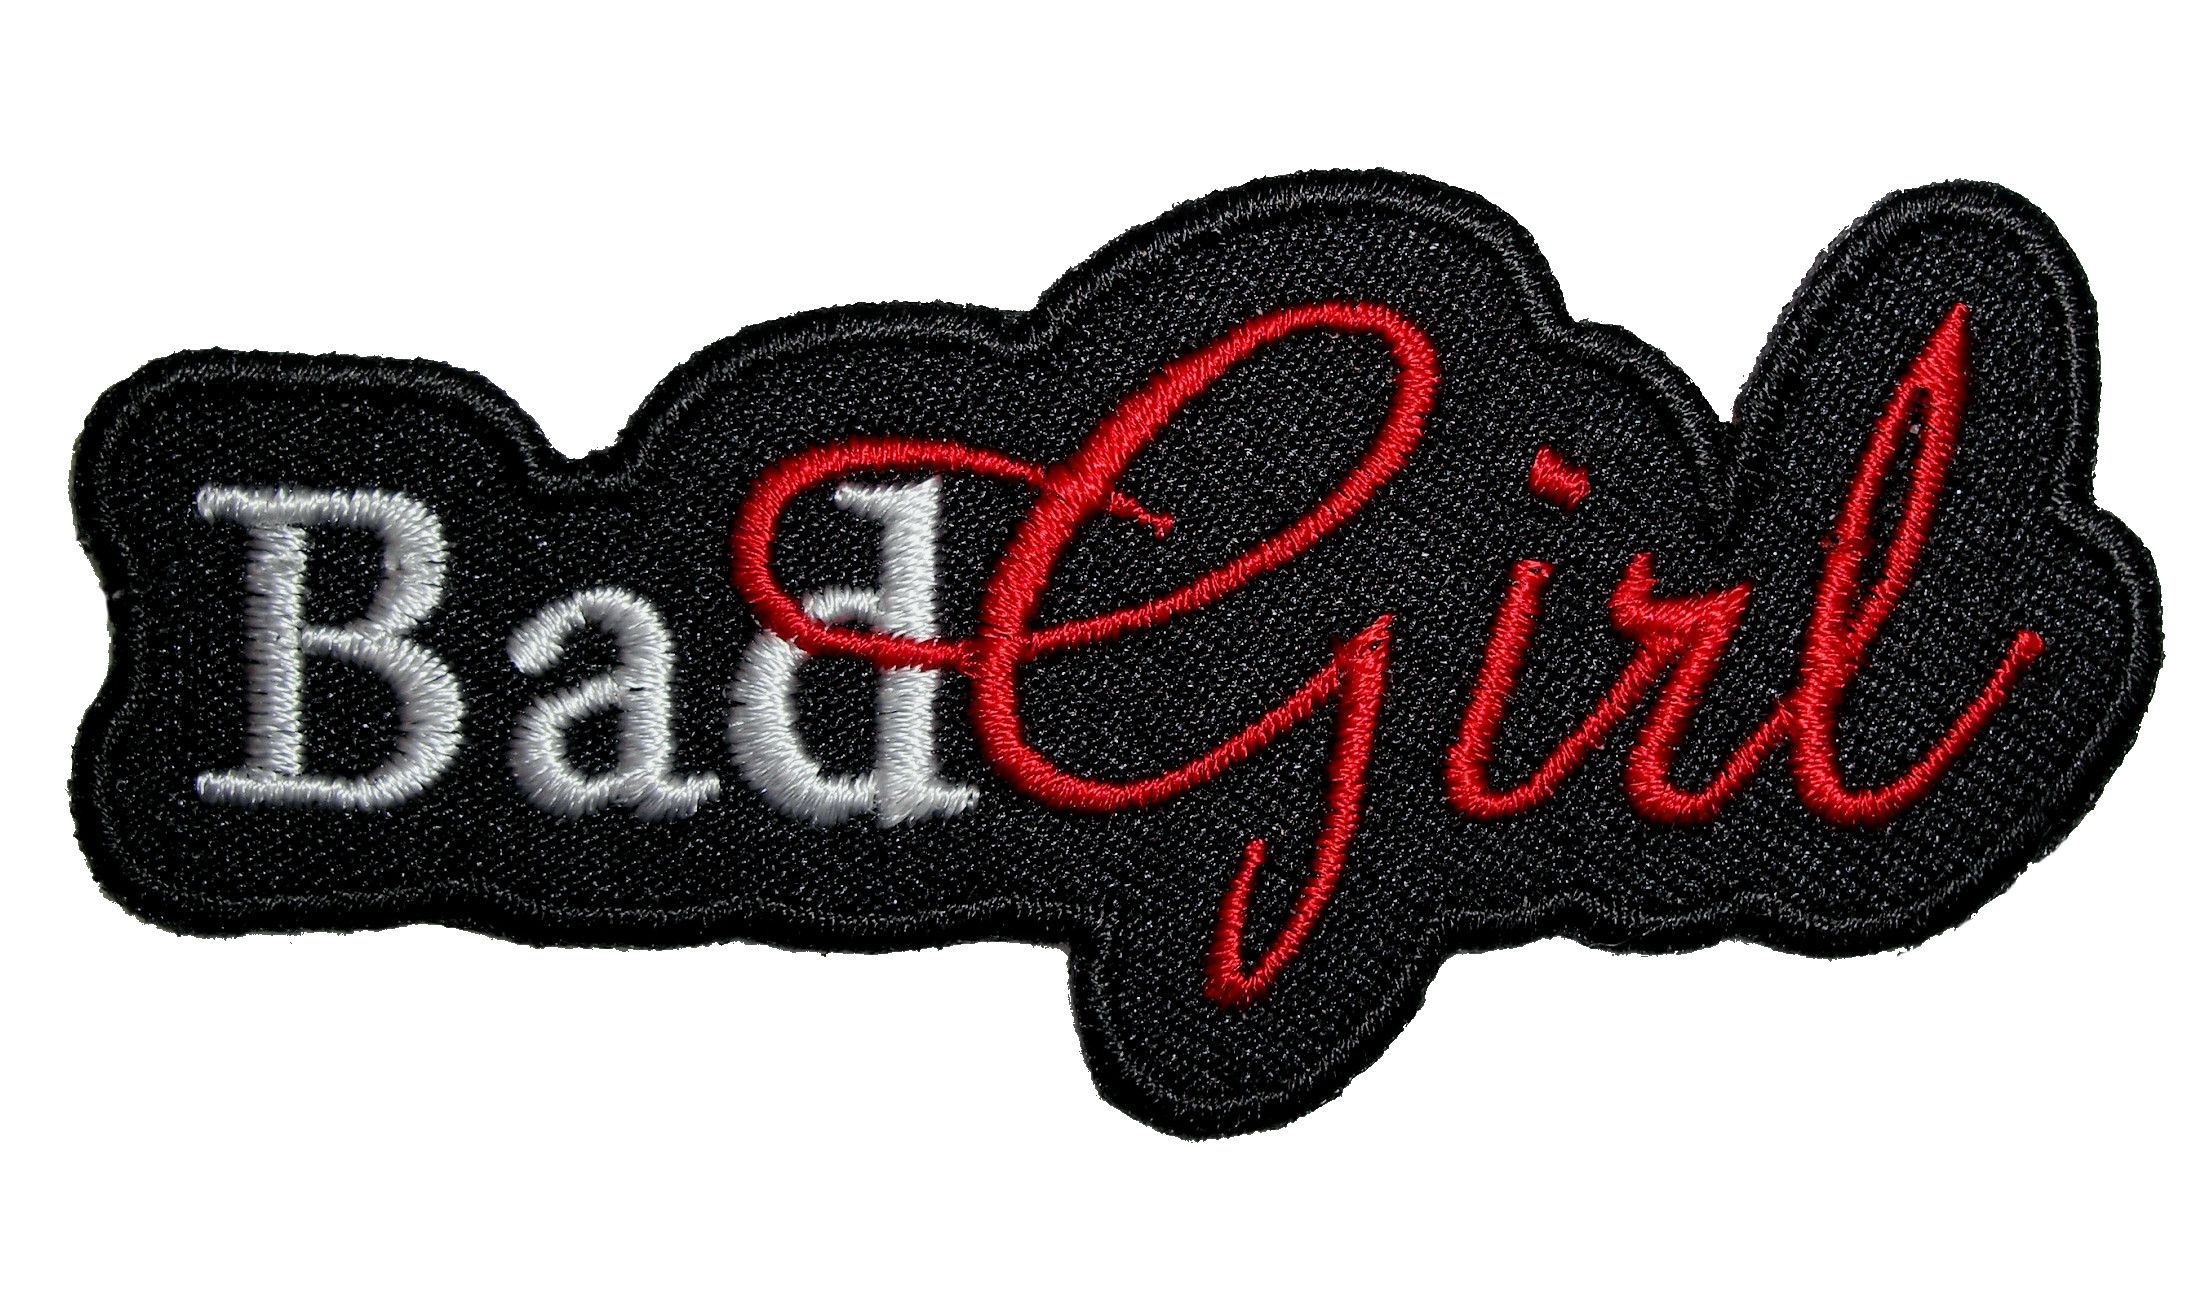 BAD GIIRL Iron On Patch Saying Words Girly